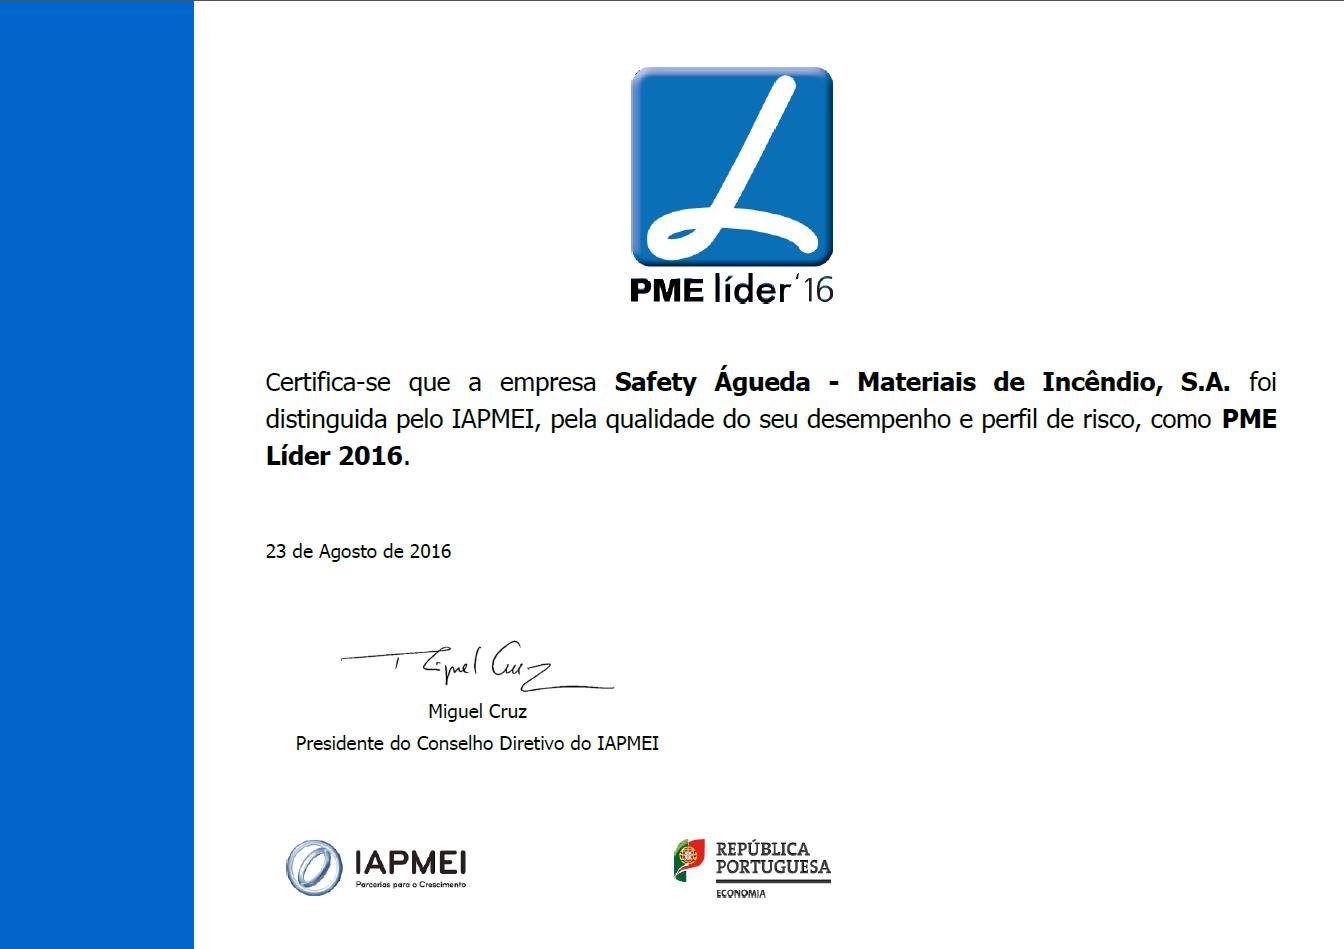 PME Líder 2016